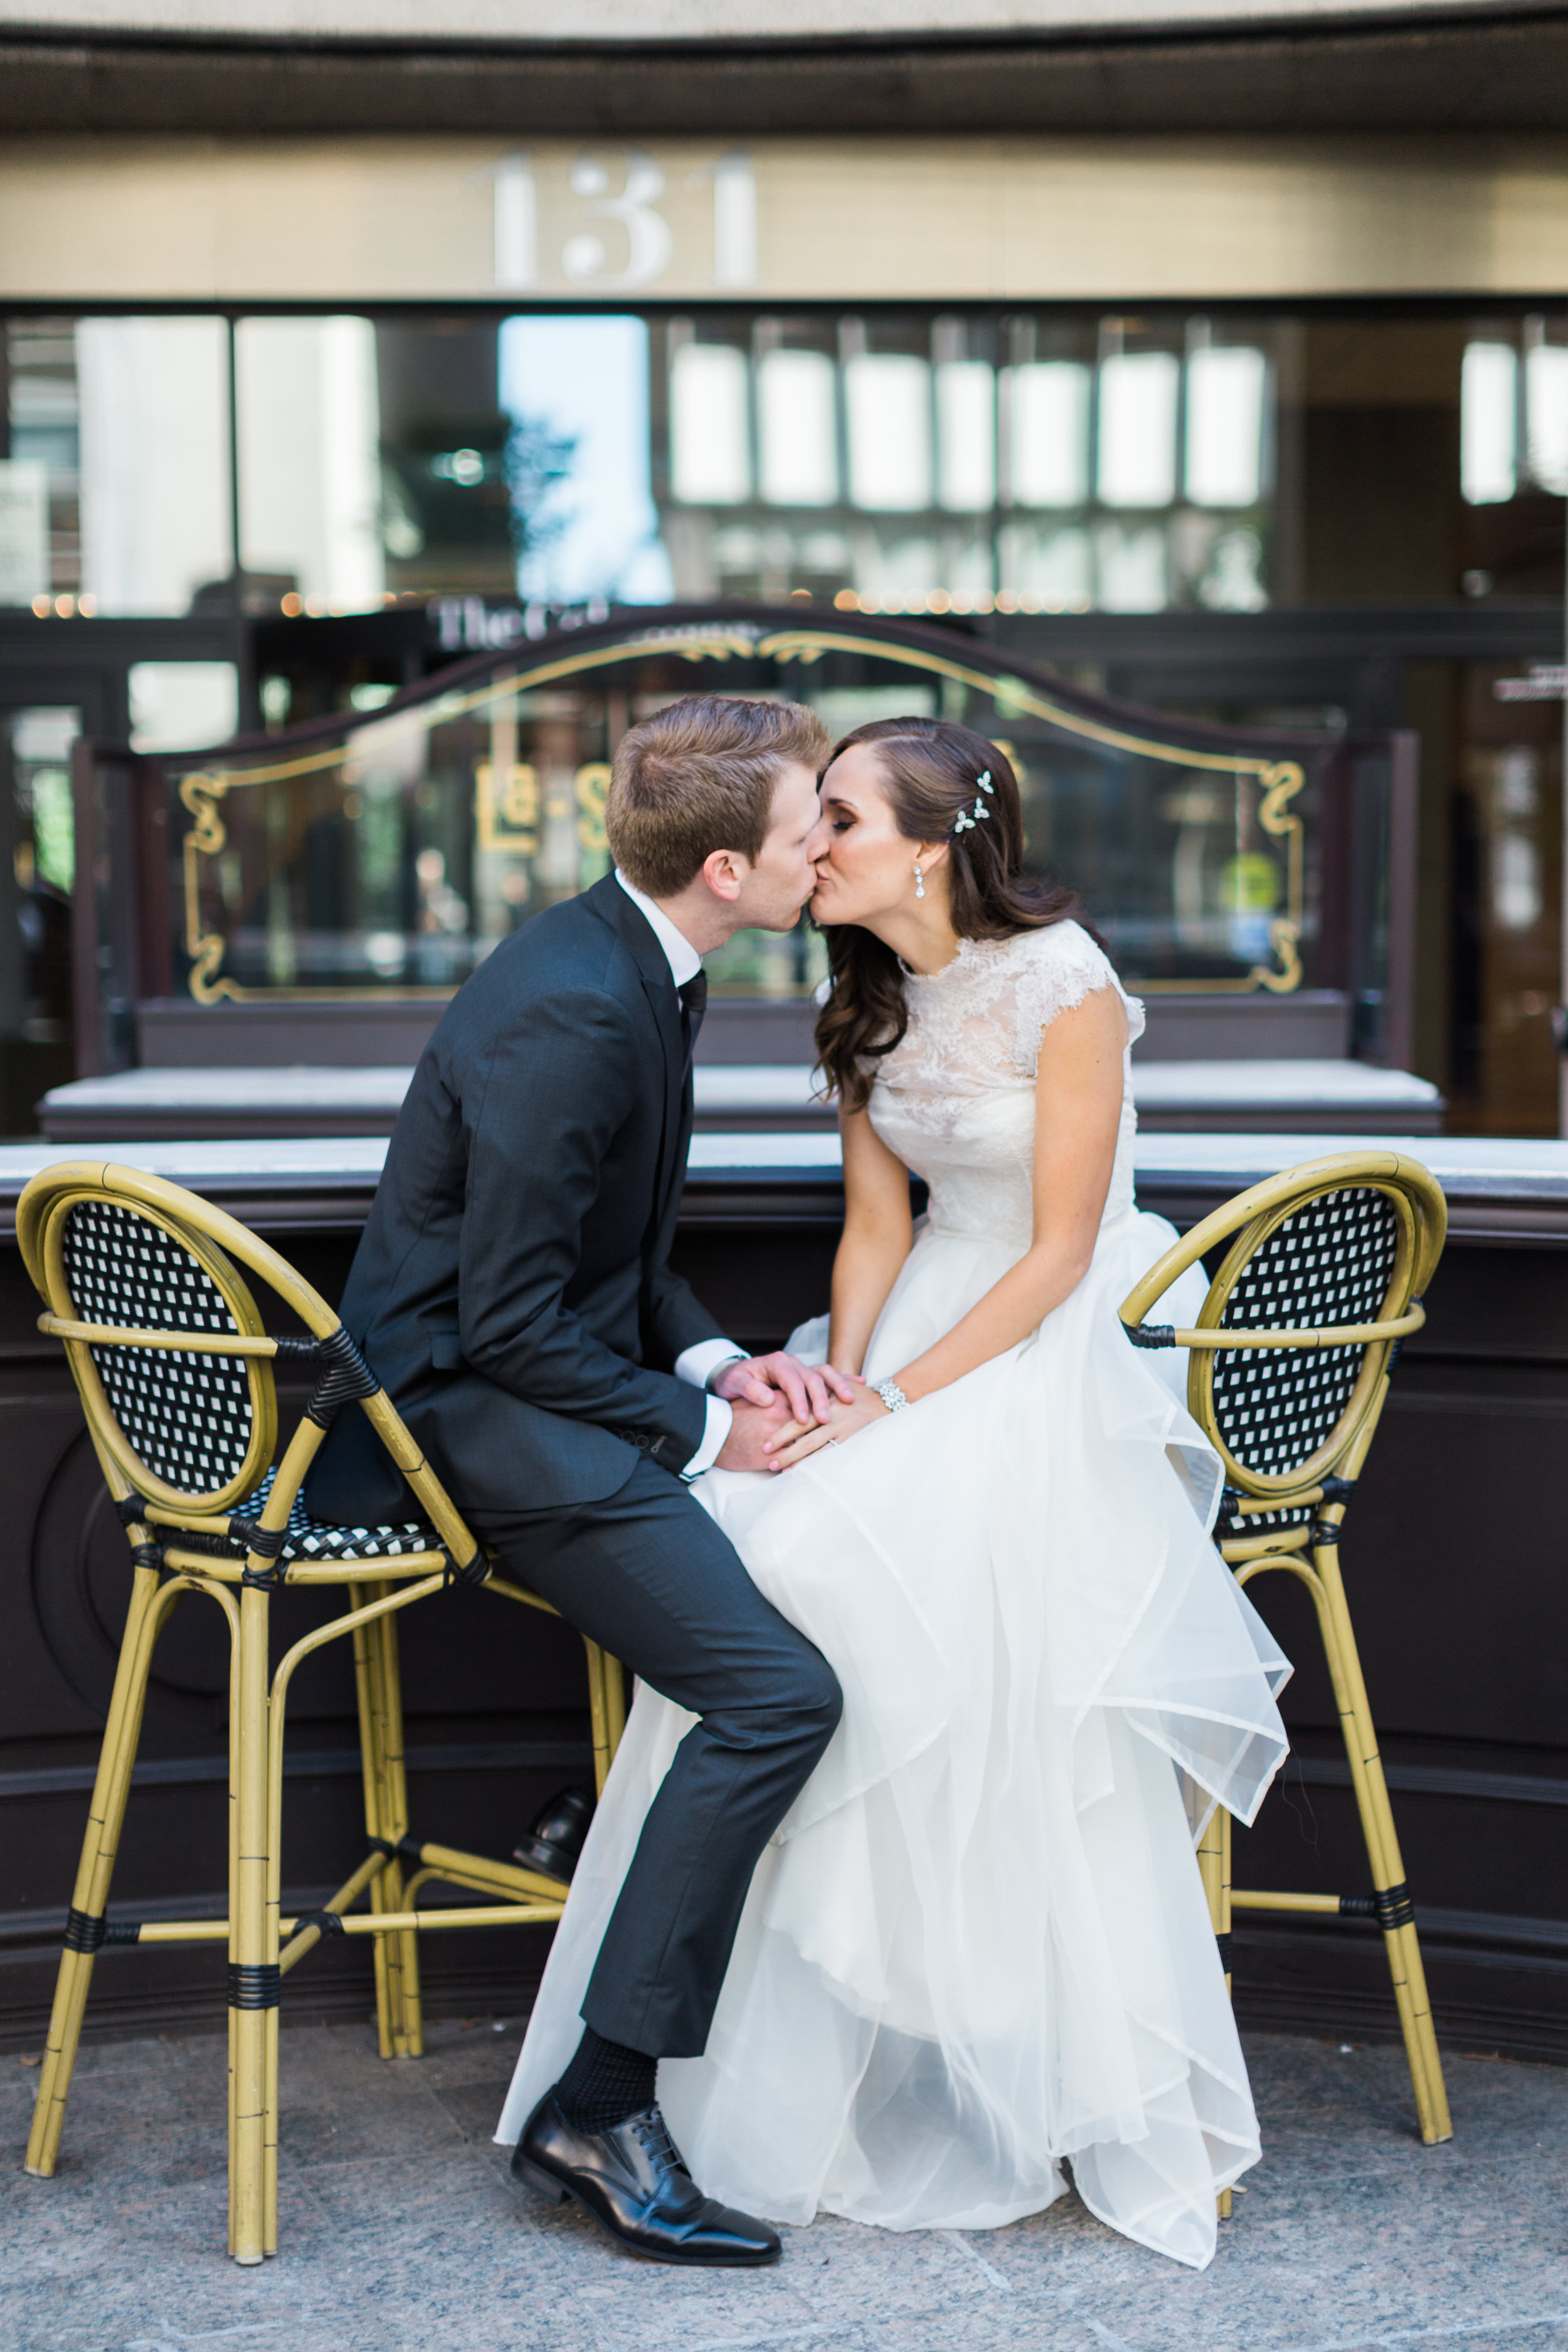 Toronto Fine Art Photographer - Yorkville Wedding - Bride & Groom Portraits-37.jpg